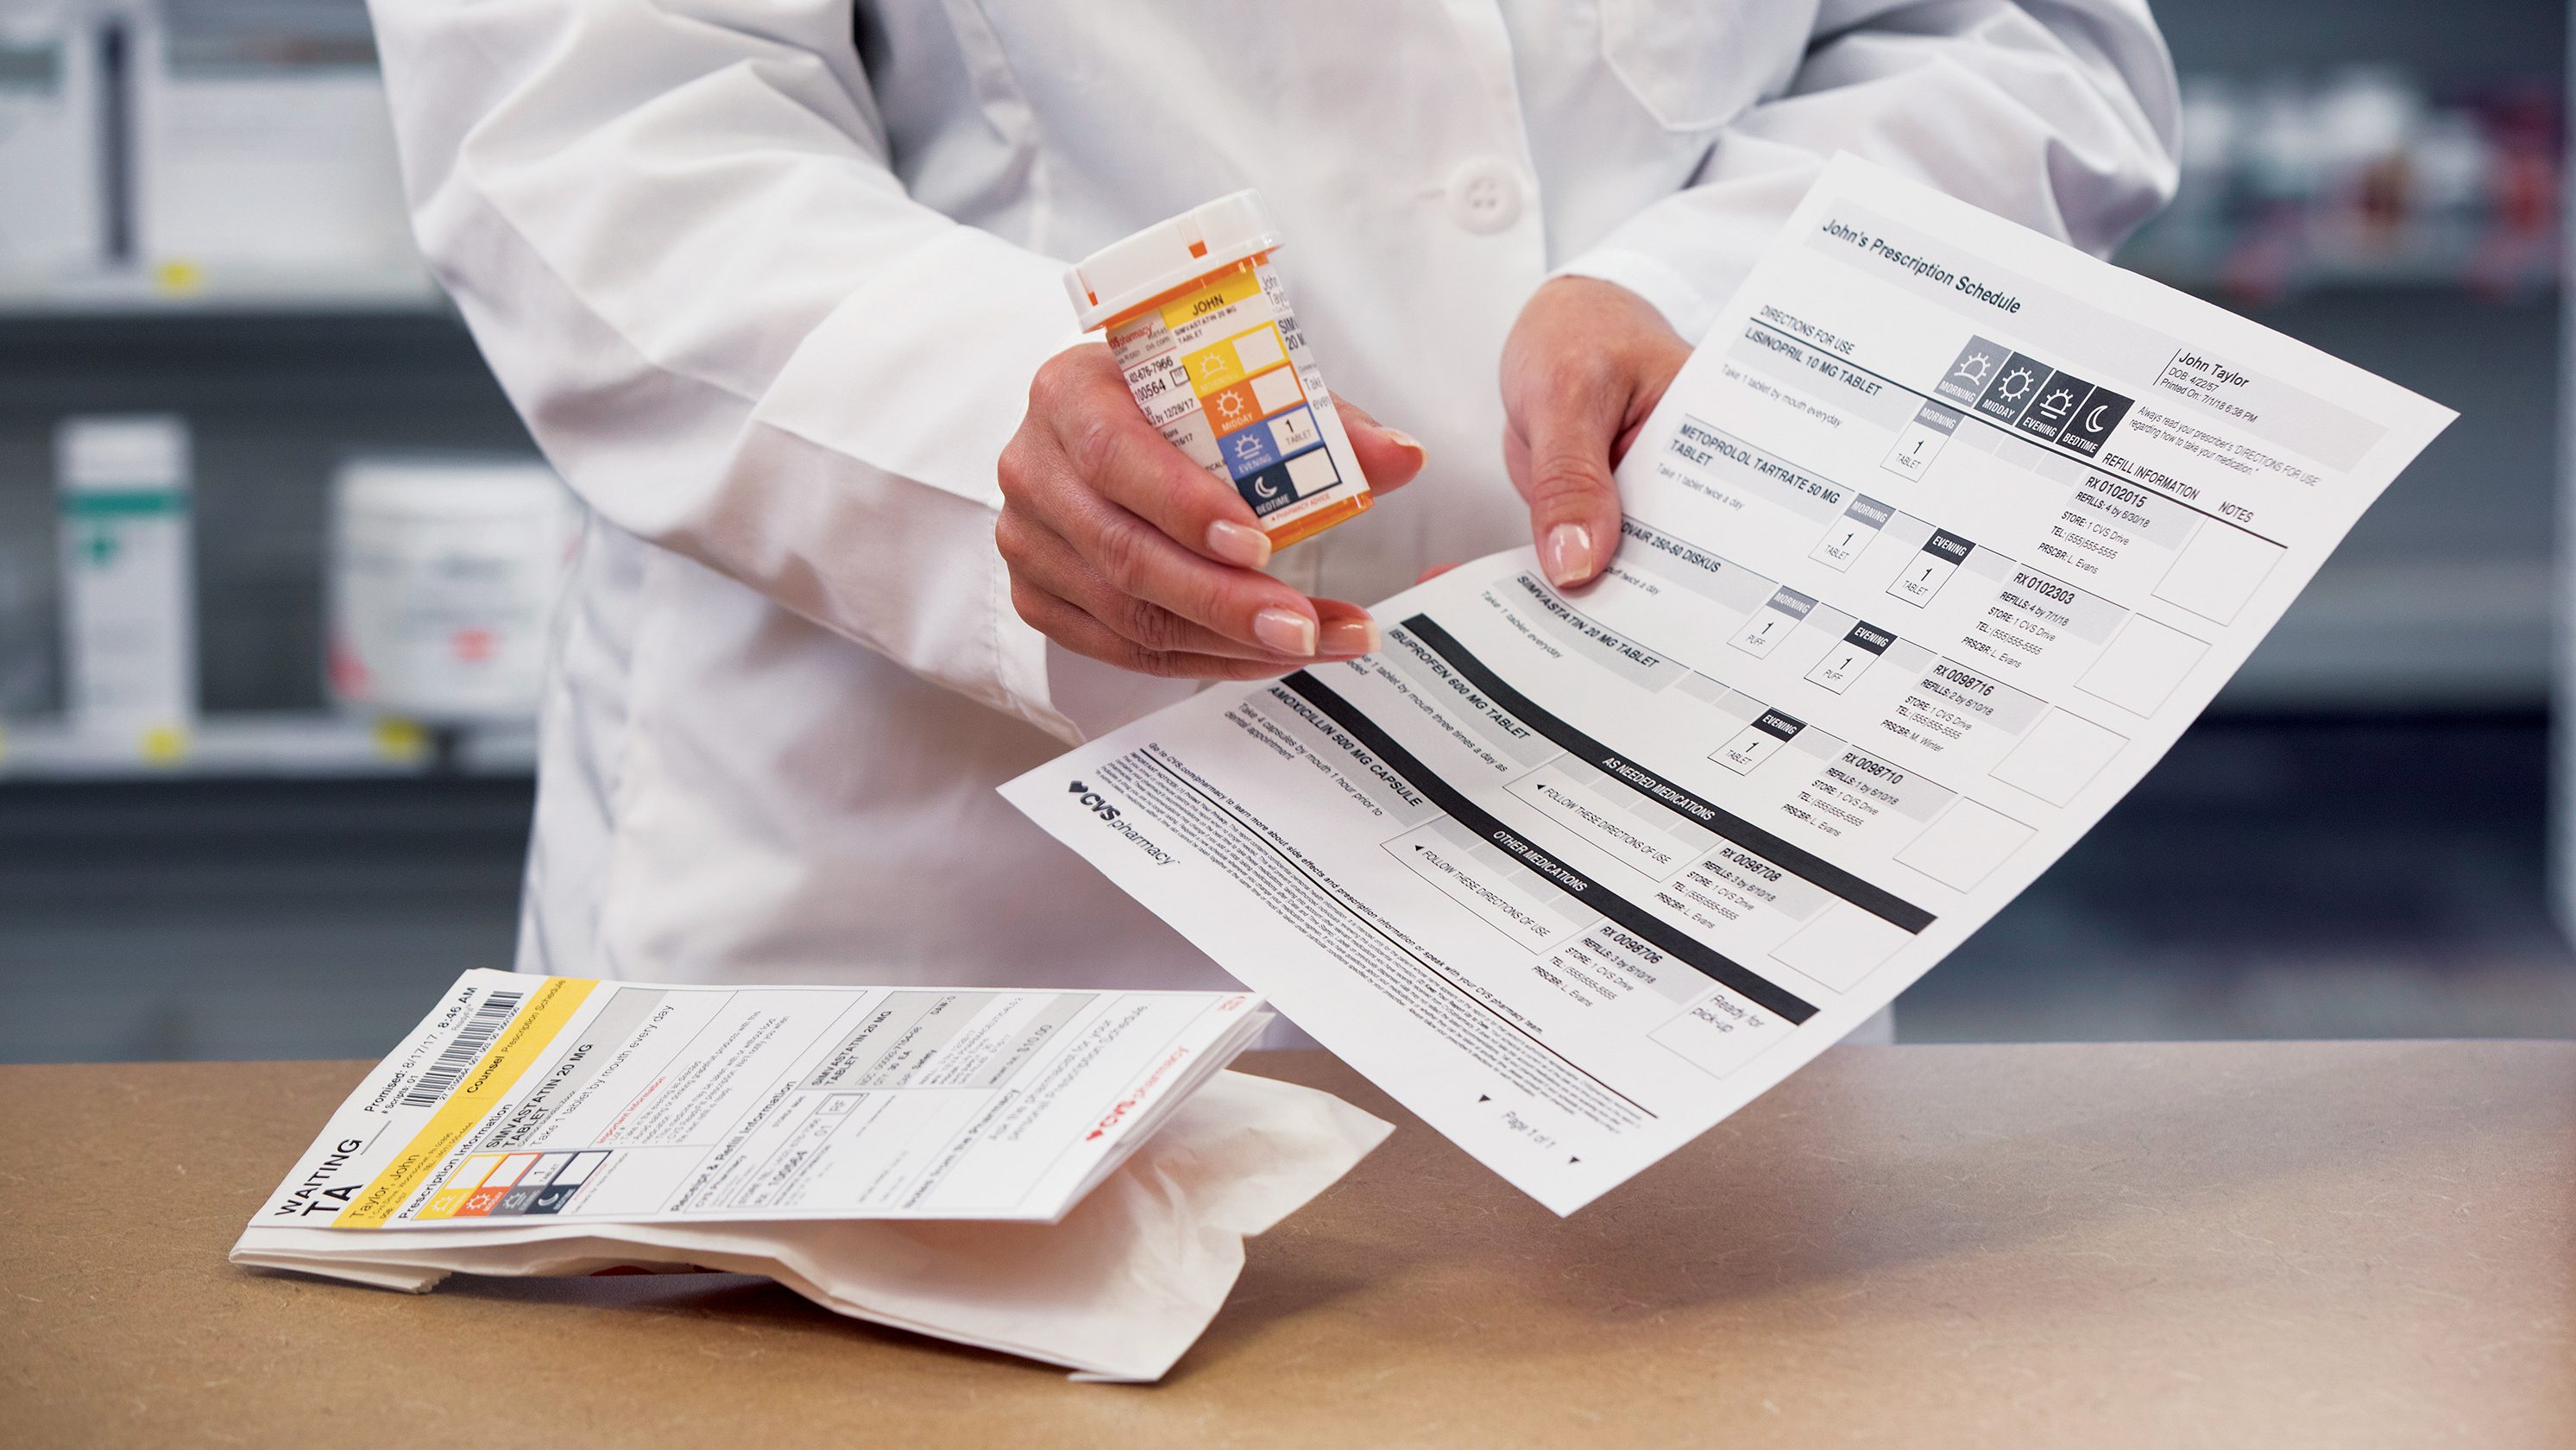 cvs-health-scriptpath-prescription-bottle-schedule-media-gallery